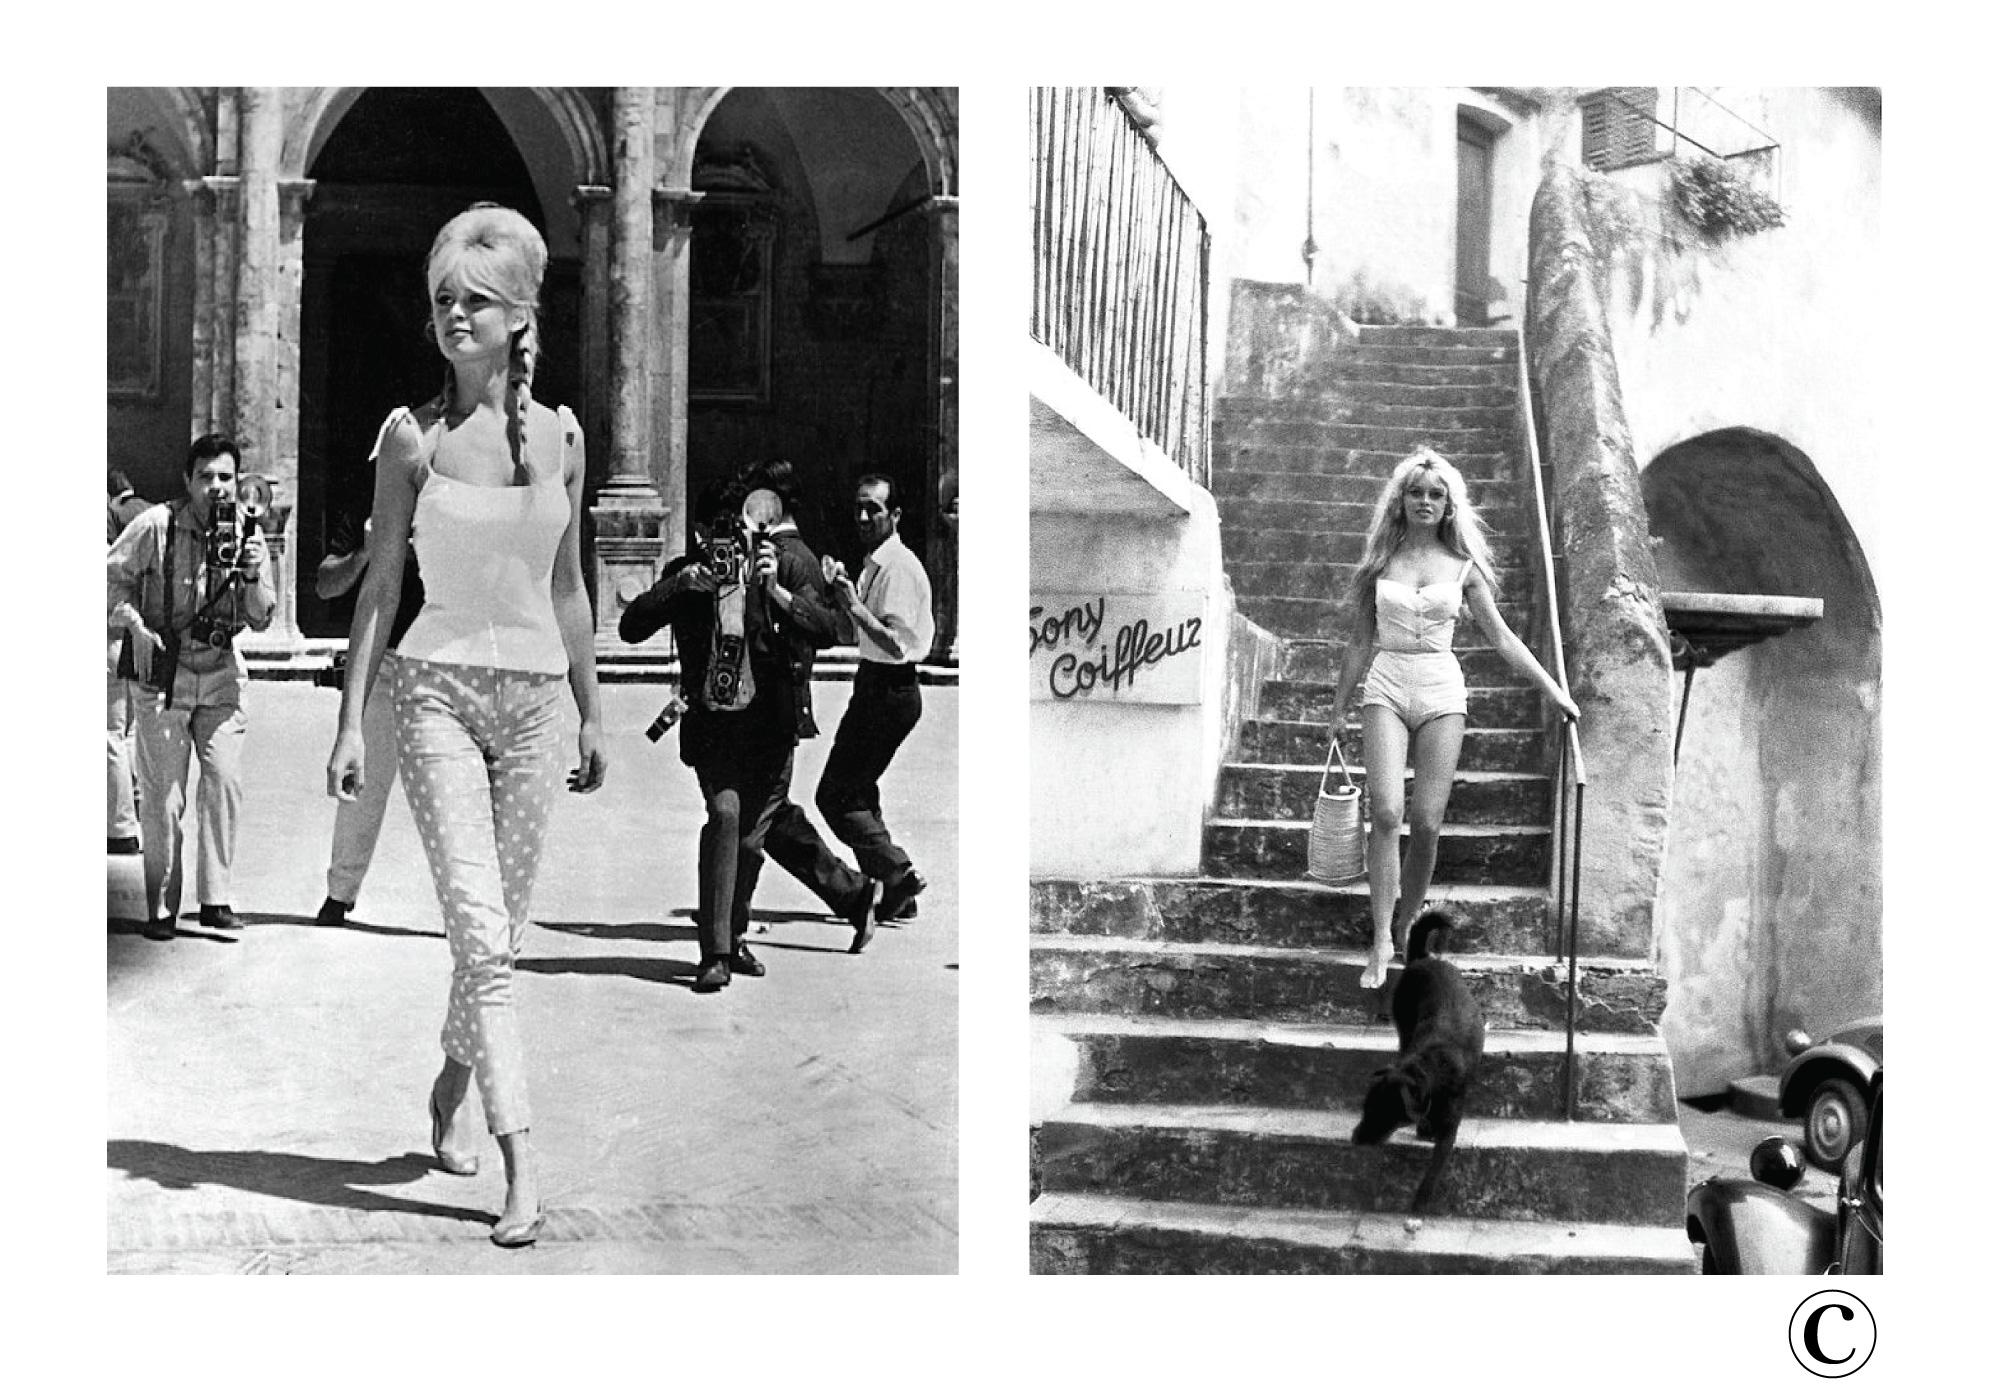 St-Tropez — Mademoiselle Jules